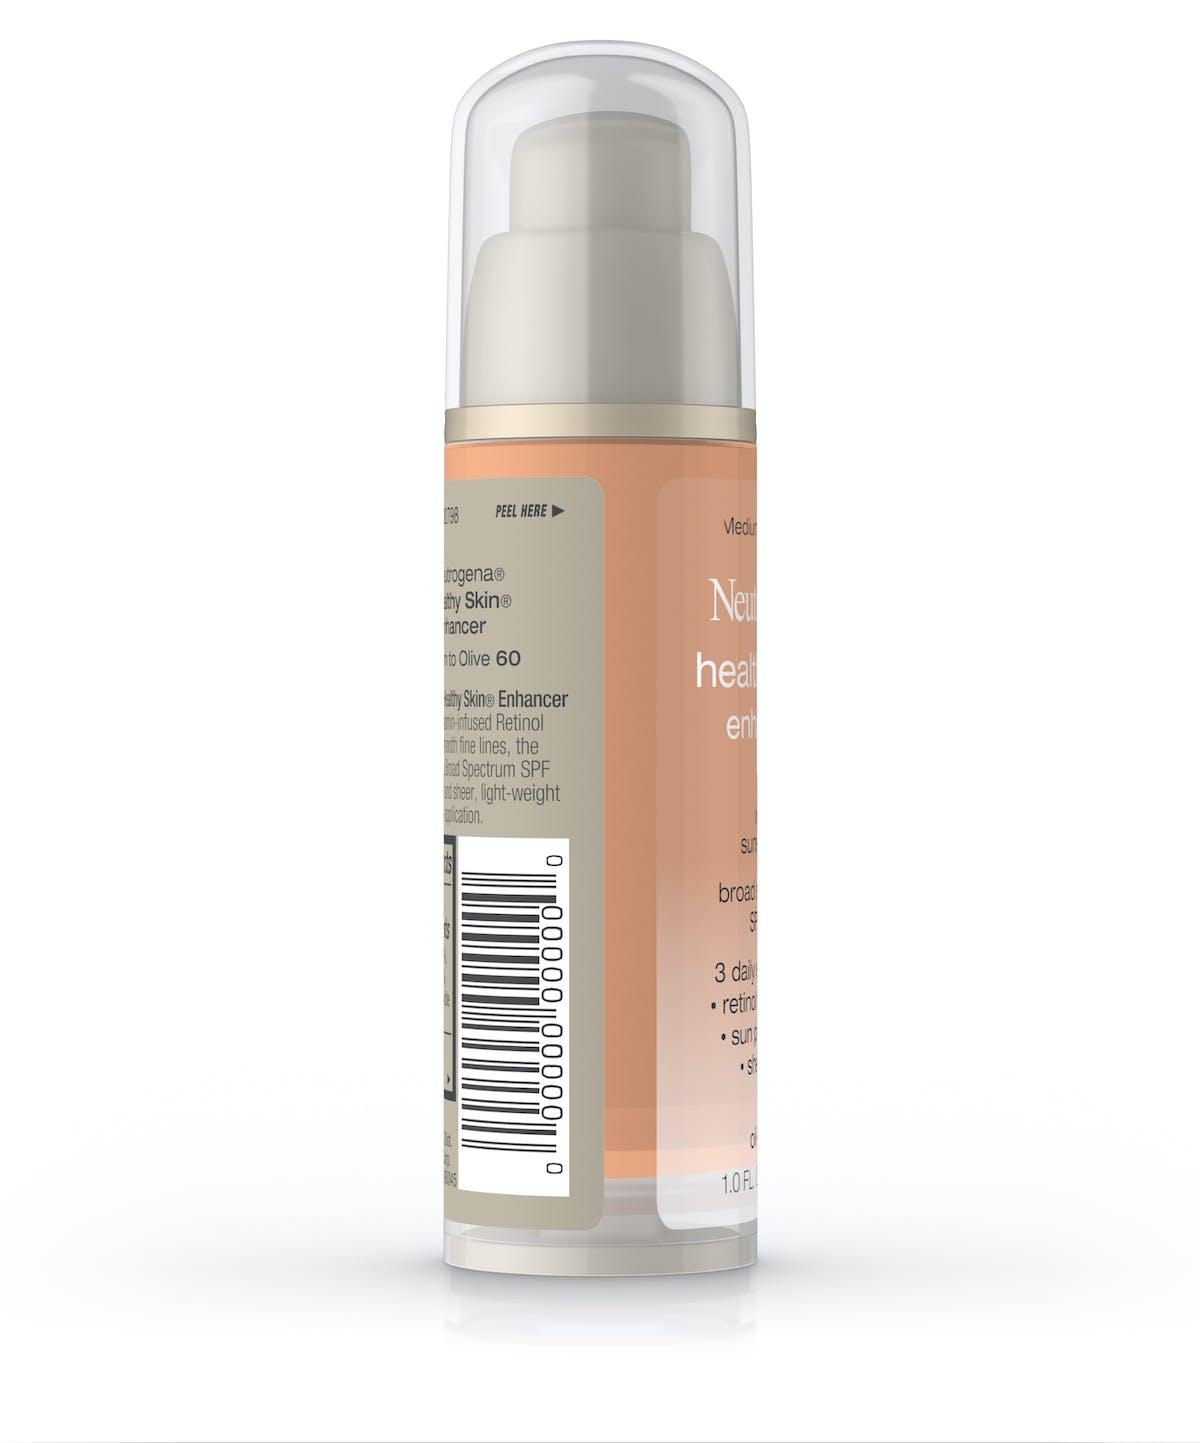 fc7f666f8 Healthy Skin Enhancer Broad Spectrum SPF 20 | Neutrogena